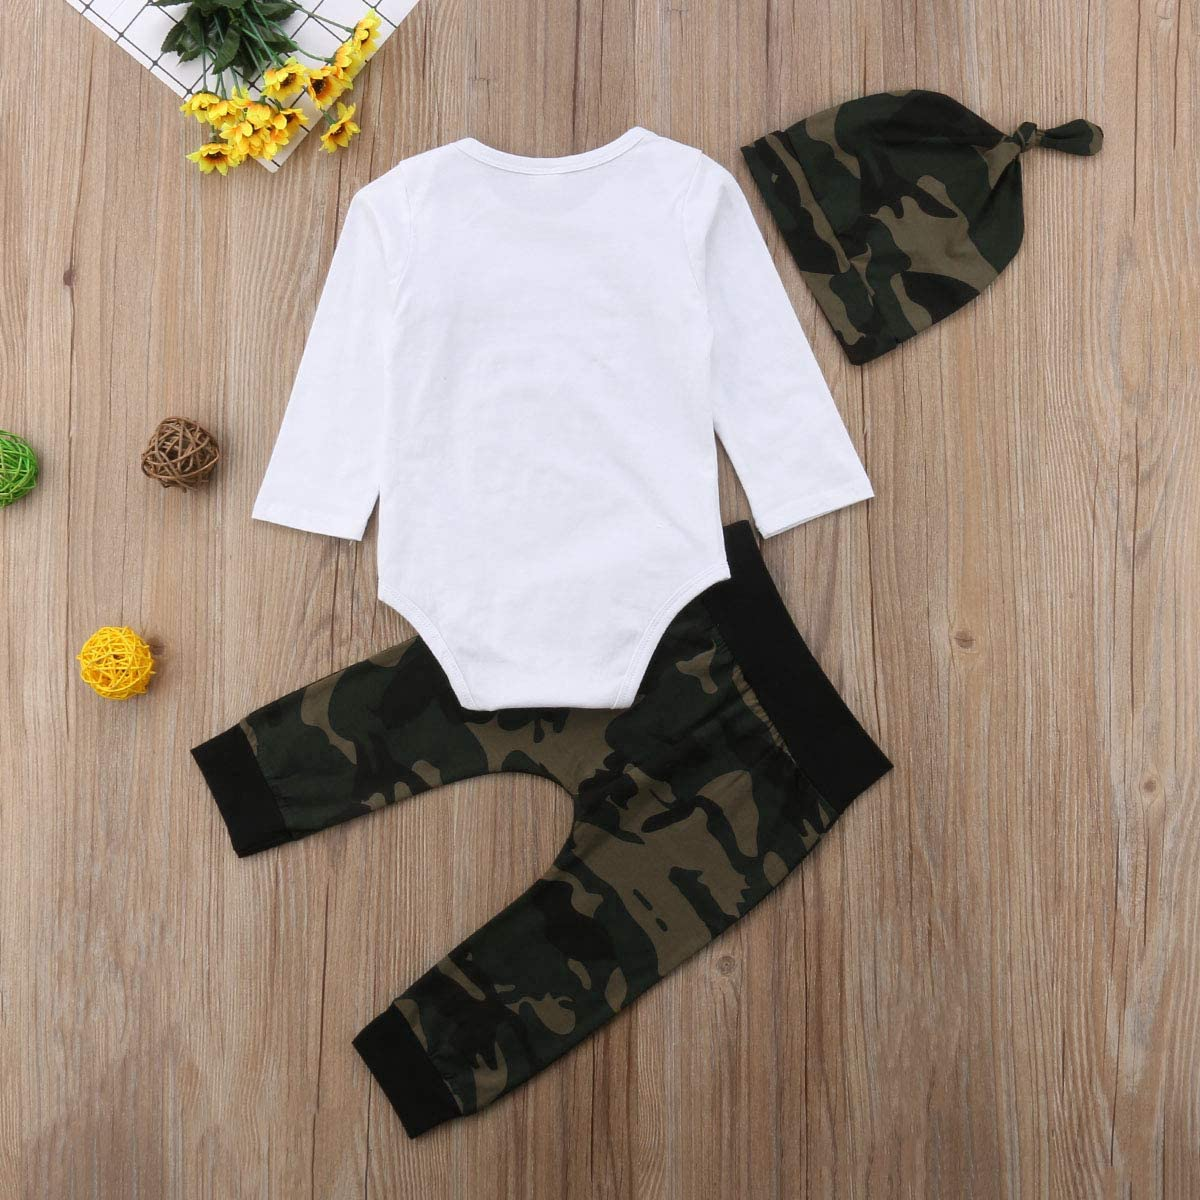 bebiullo 3PCS Newborn Baby Letter Print Romper Jumpsuit Army Green Pants Hat Clothing Outfits Set